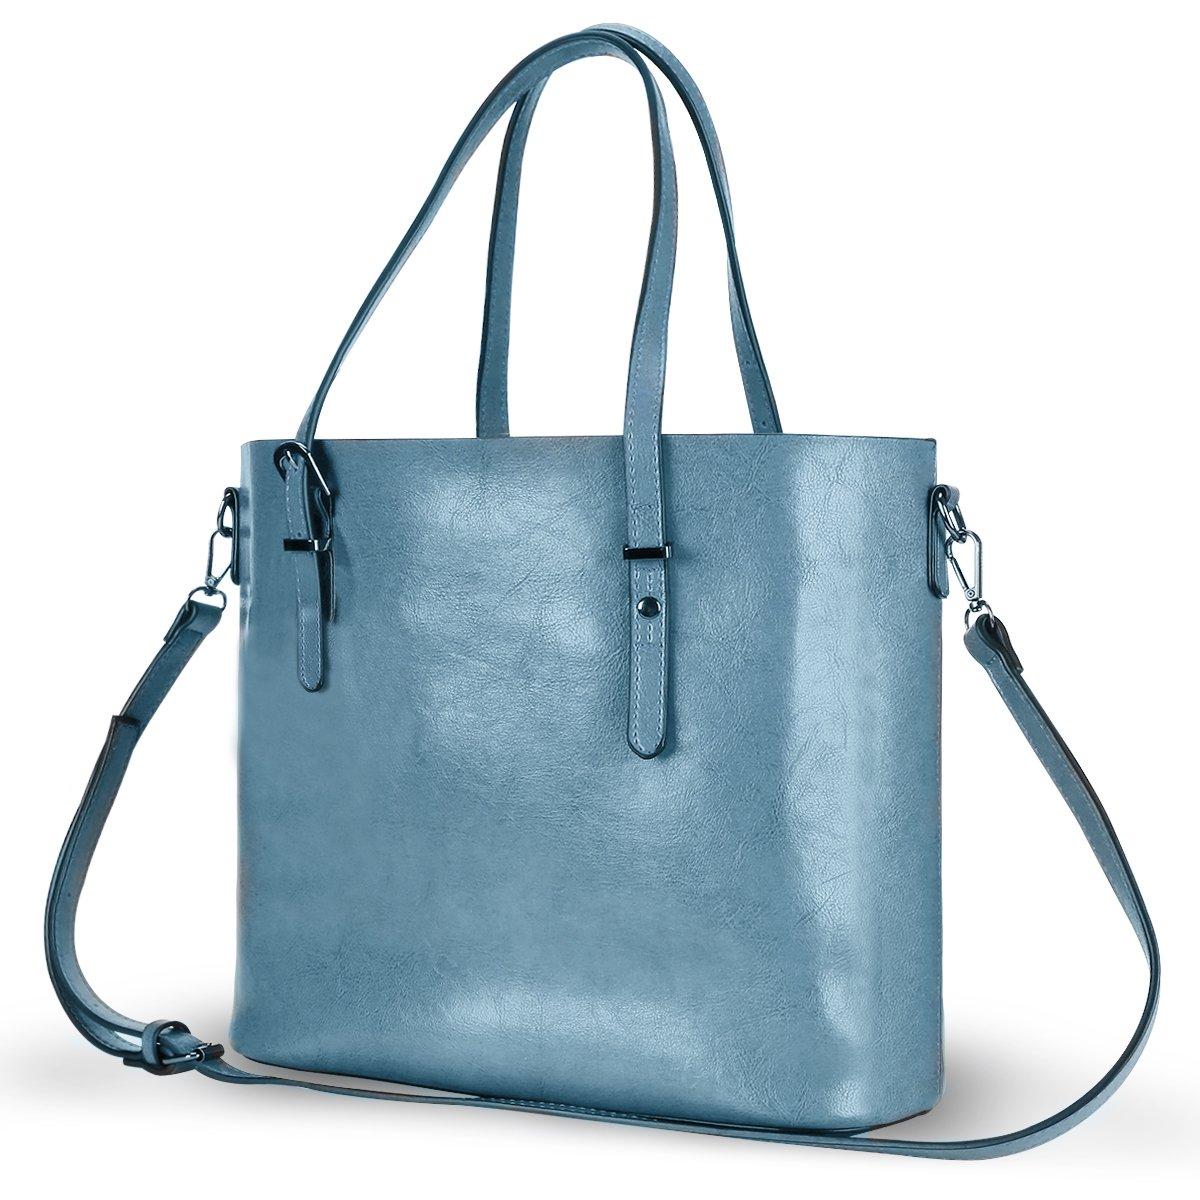 Women Top Handle Satchel Handbags Shoulder Bag Messenger Tote Bag Purse IUKIO (Light Blue)